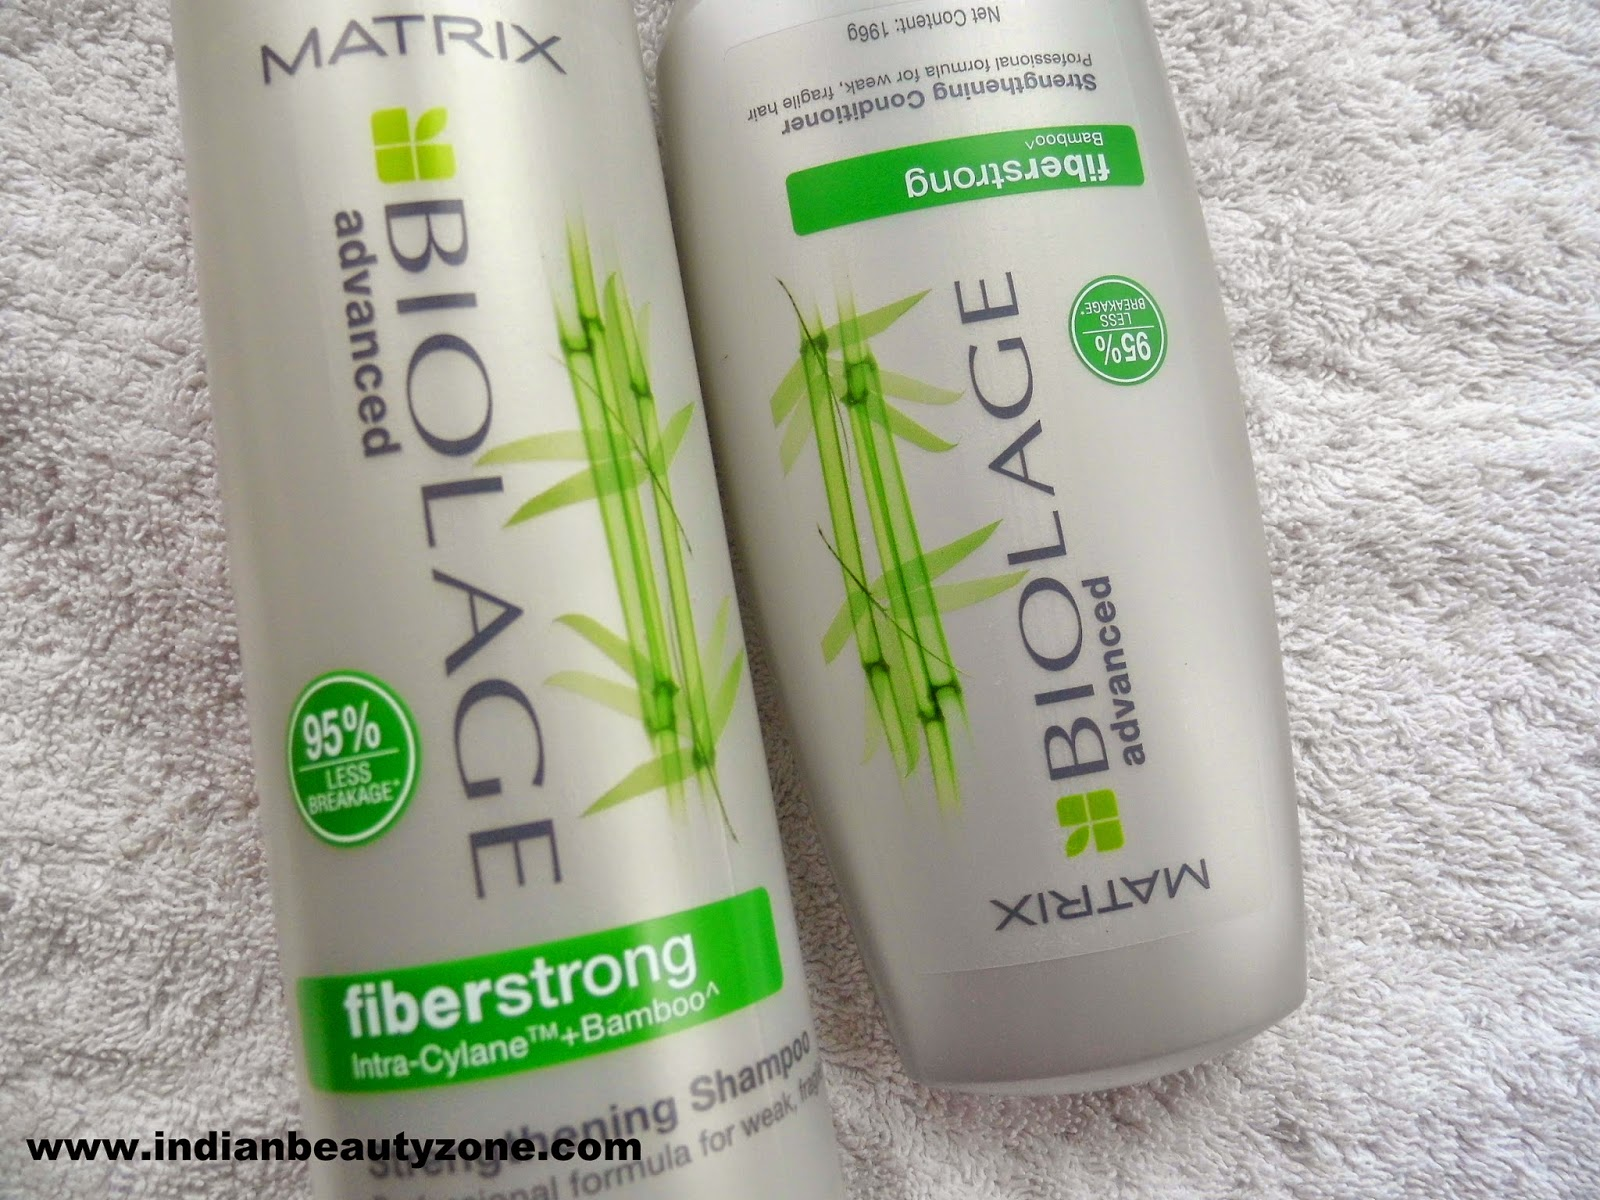 Matrix hair brush 4 - Matrix Biolage Advanced Fiberstrong Strengthening Shampoo And Conditioner Review